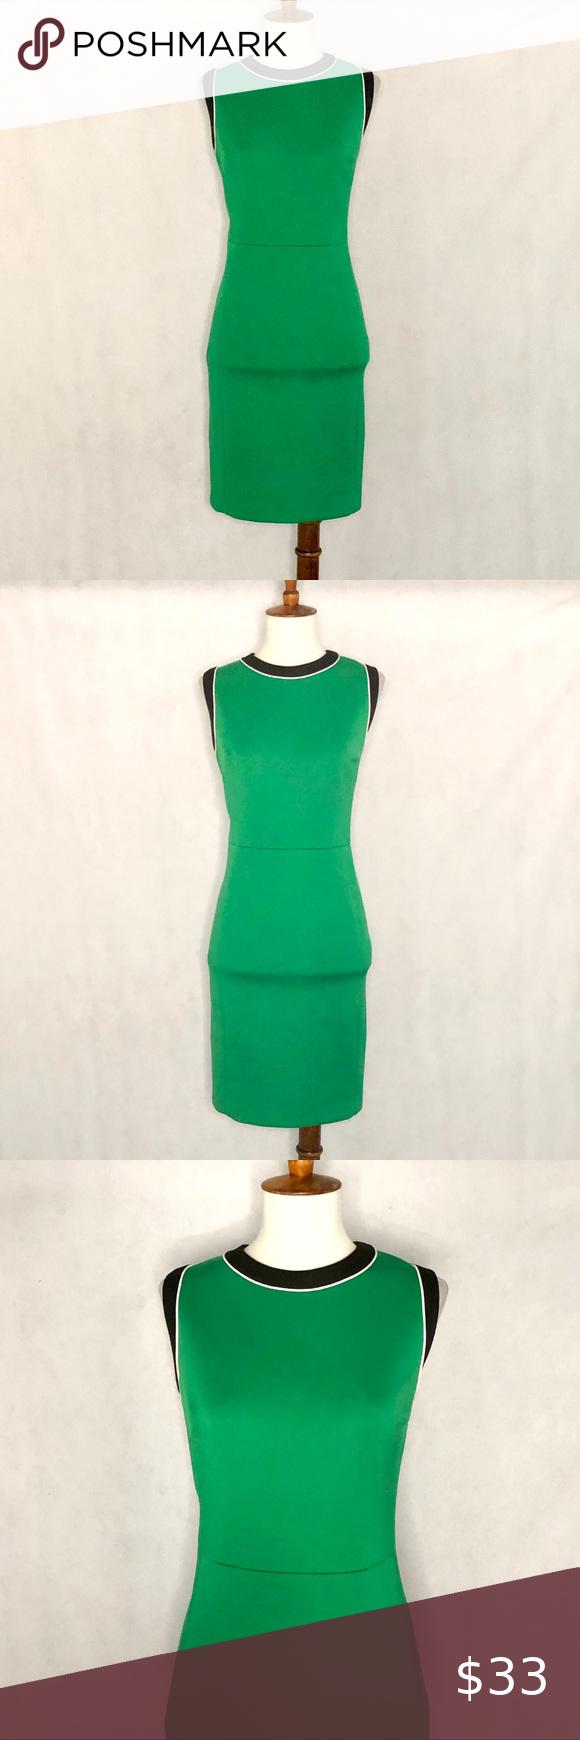 Vince Camuto Sleeveless Scuba Knit Sheath Dress Knit Sheath Dress Slim Fit Skirts Scuba Knit [ 1740 x 580 Pixel ]